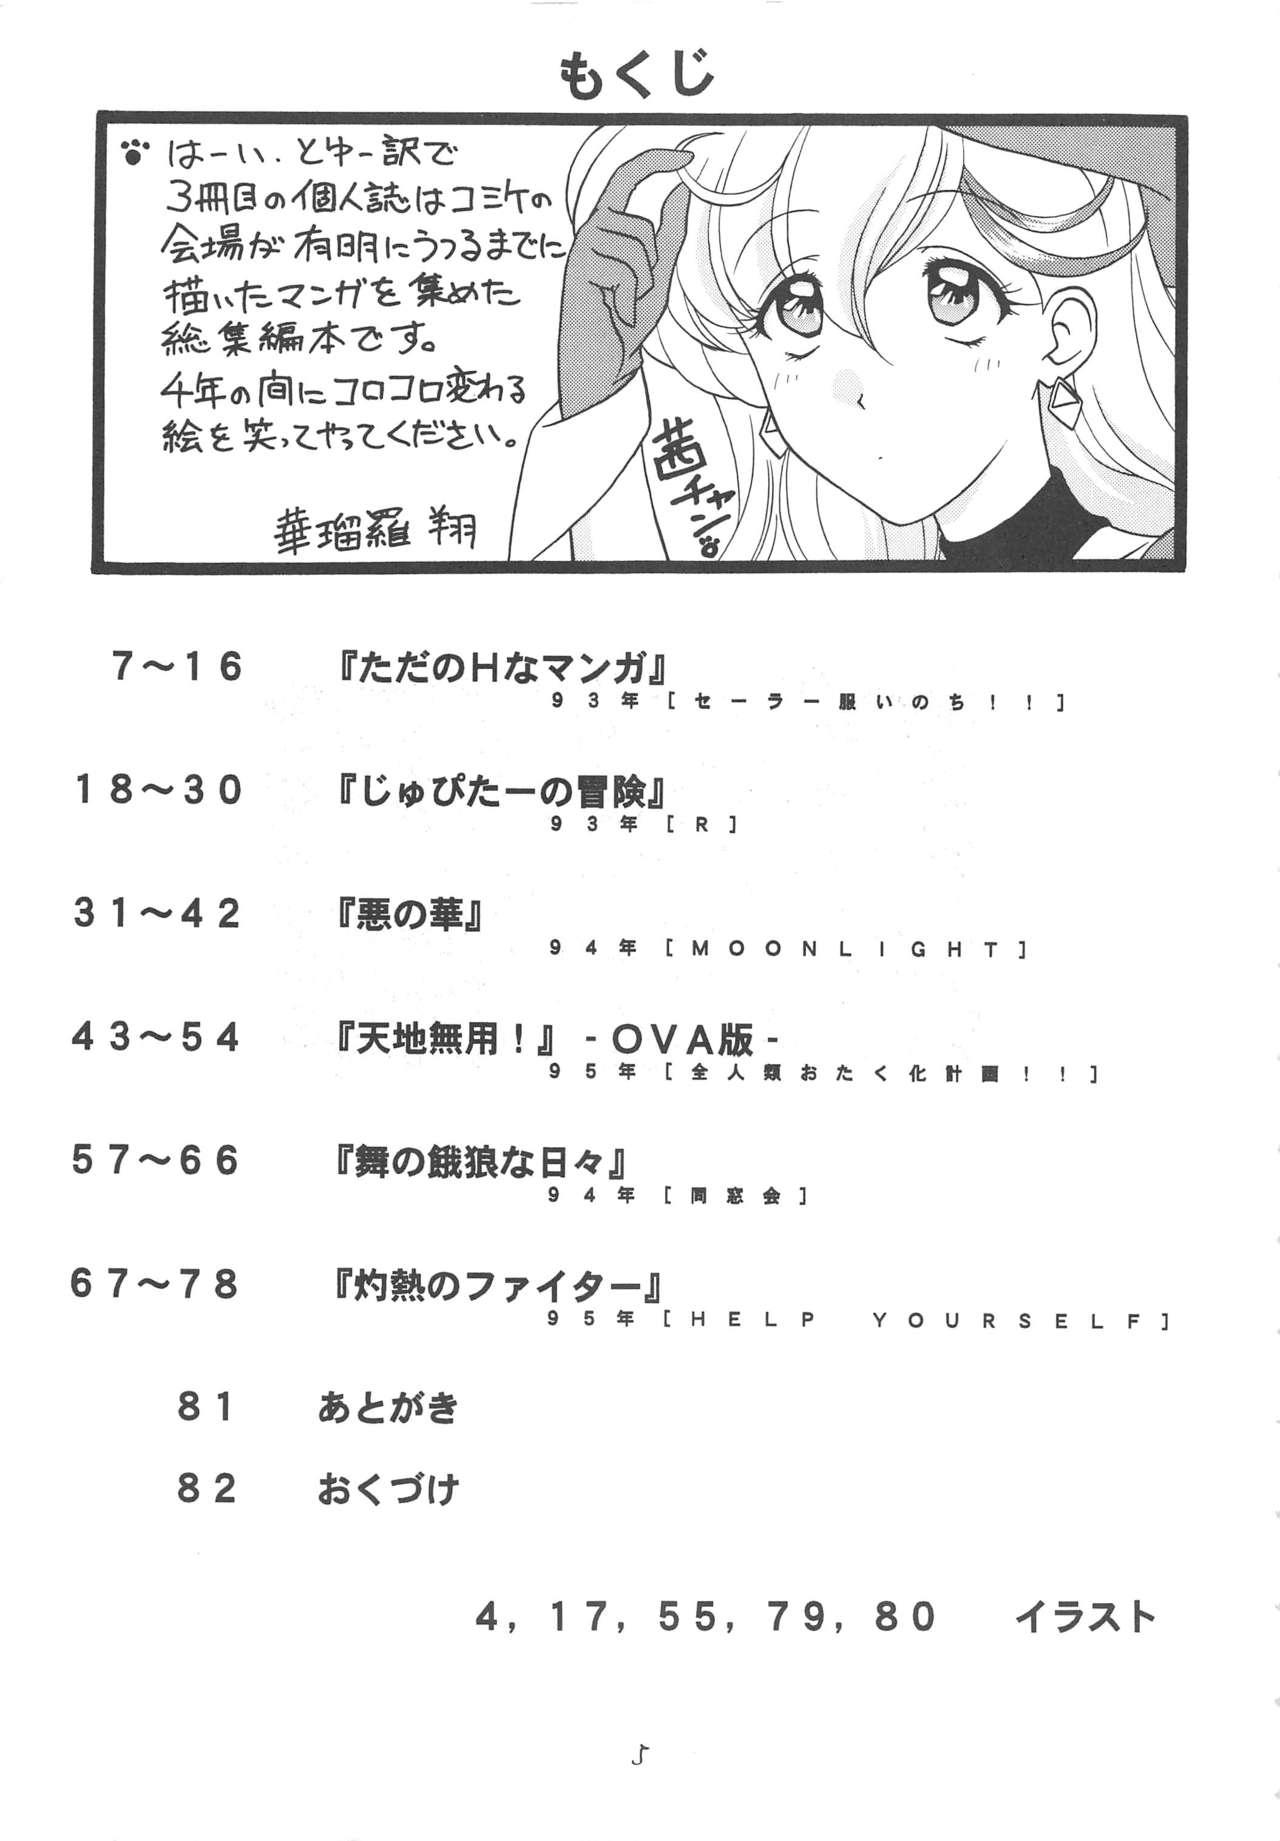 INDIVIDUAL 3 - 19930816 → 4